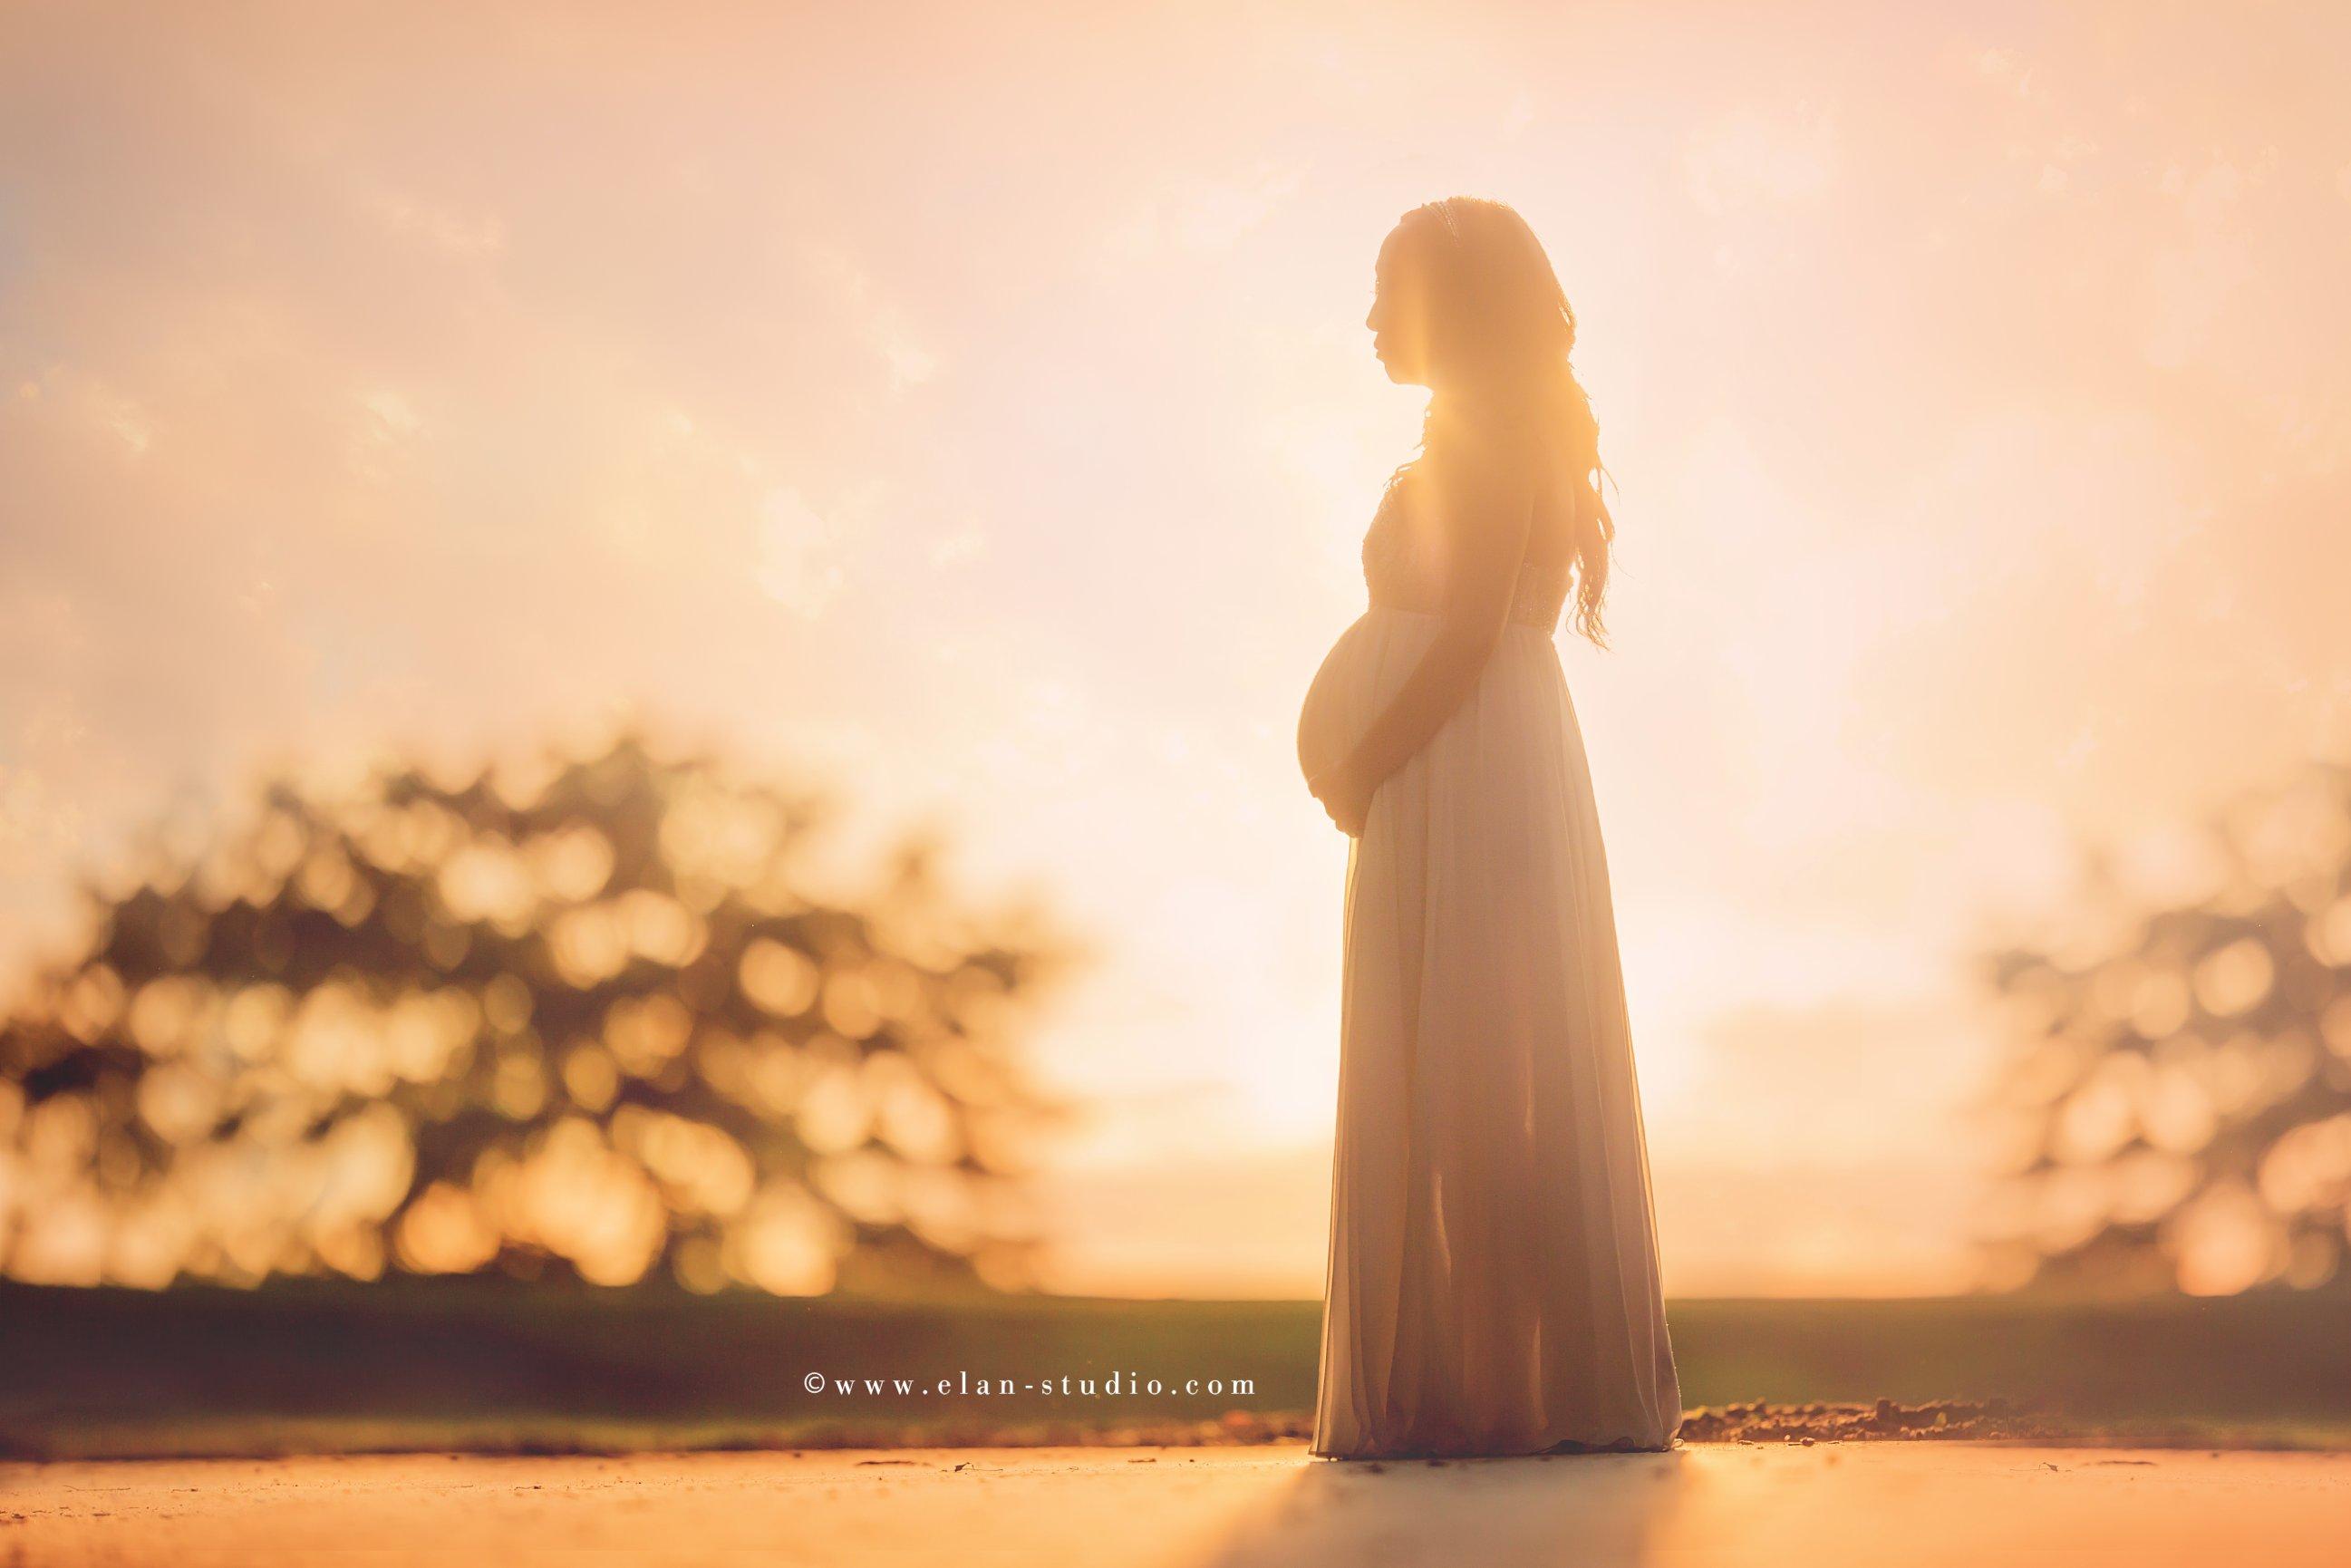 silhouette bump, silhouette maternity photo, silhouette bump image, Tracy Sweeney